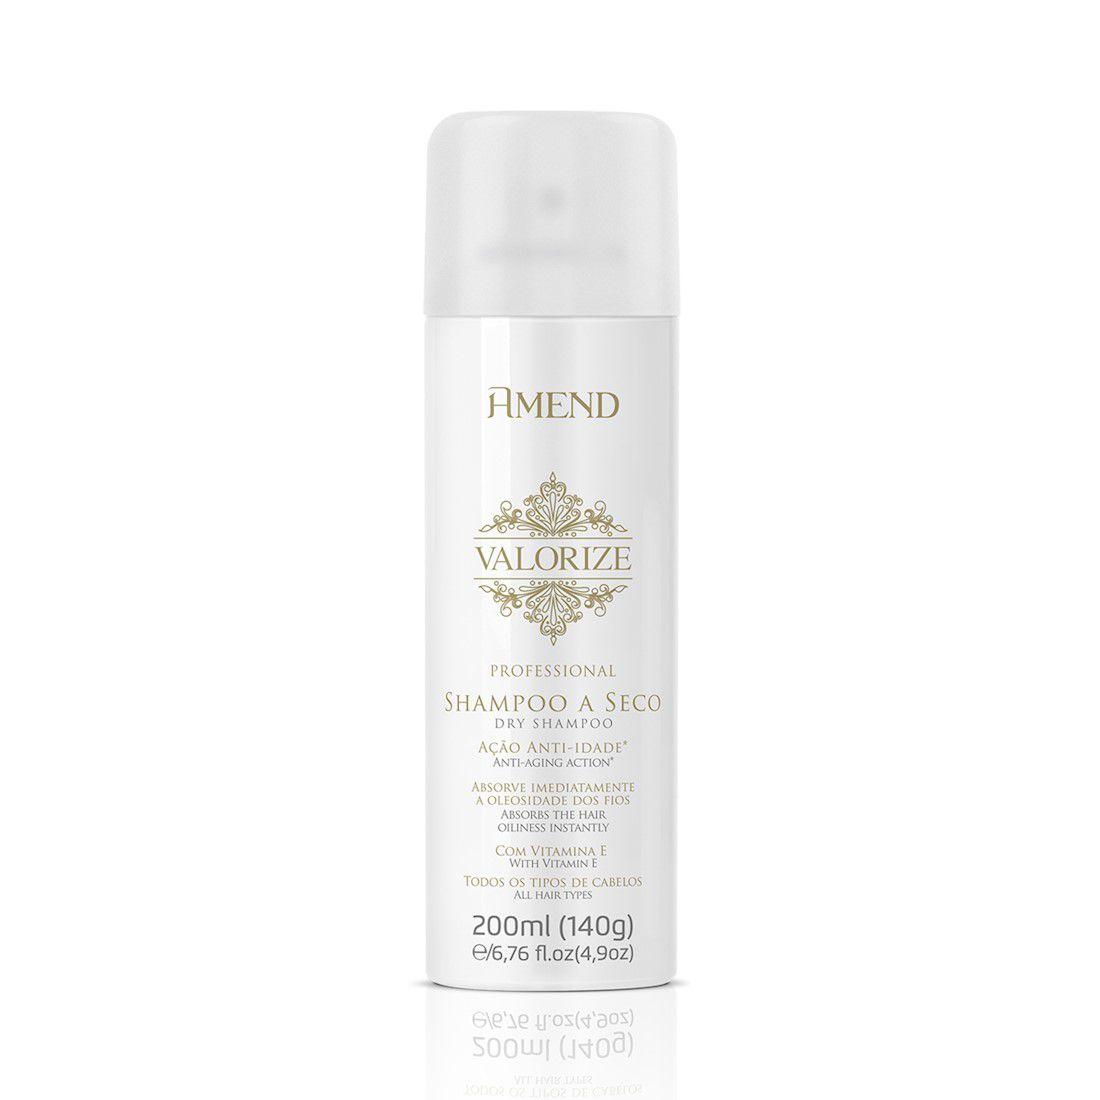 Amend Shampoo Seco Valorize Professional 200mL